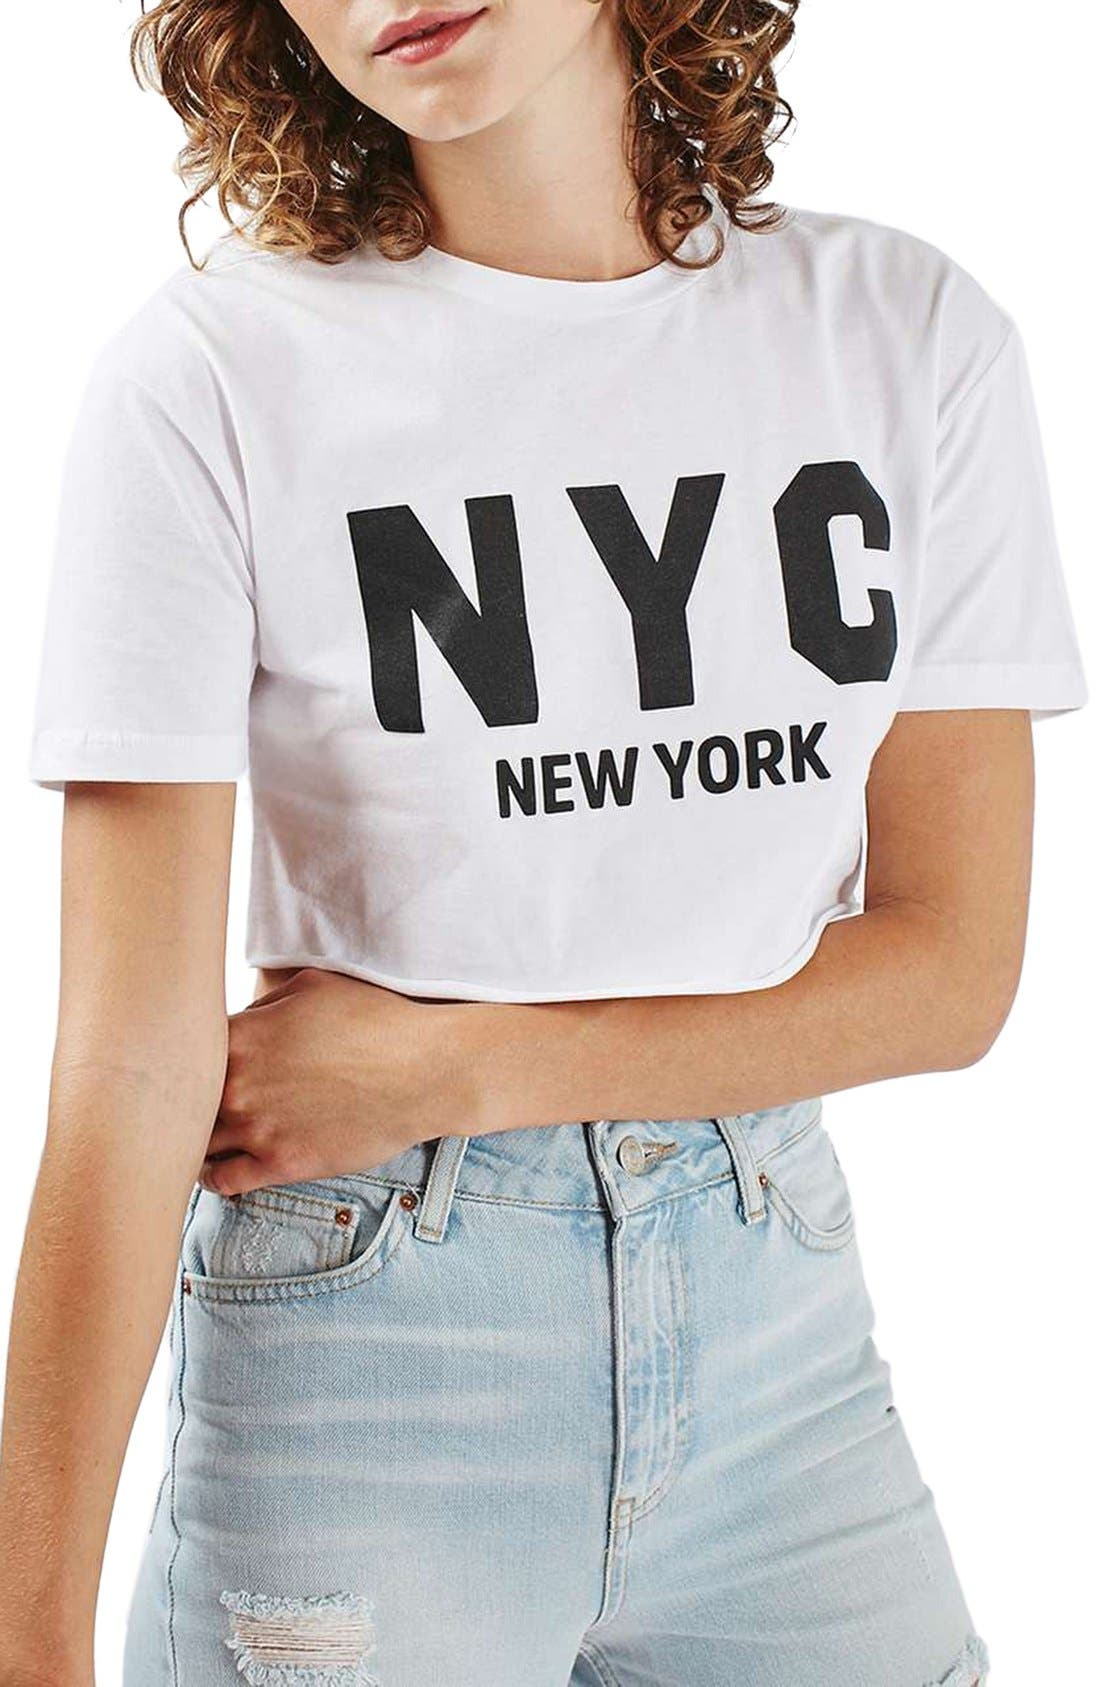 Alternate Image 1 Selected - Topshop New York Graphic Crop Top (Regular & Petite)